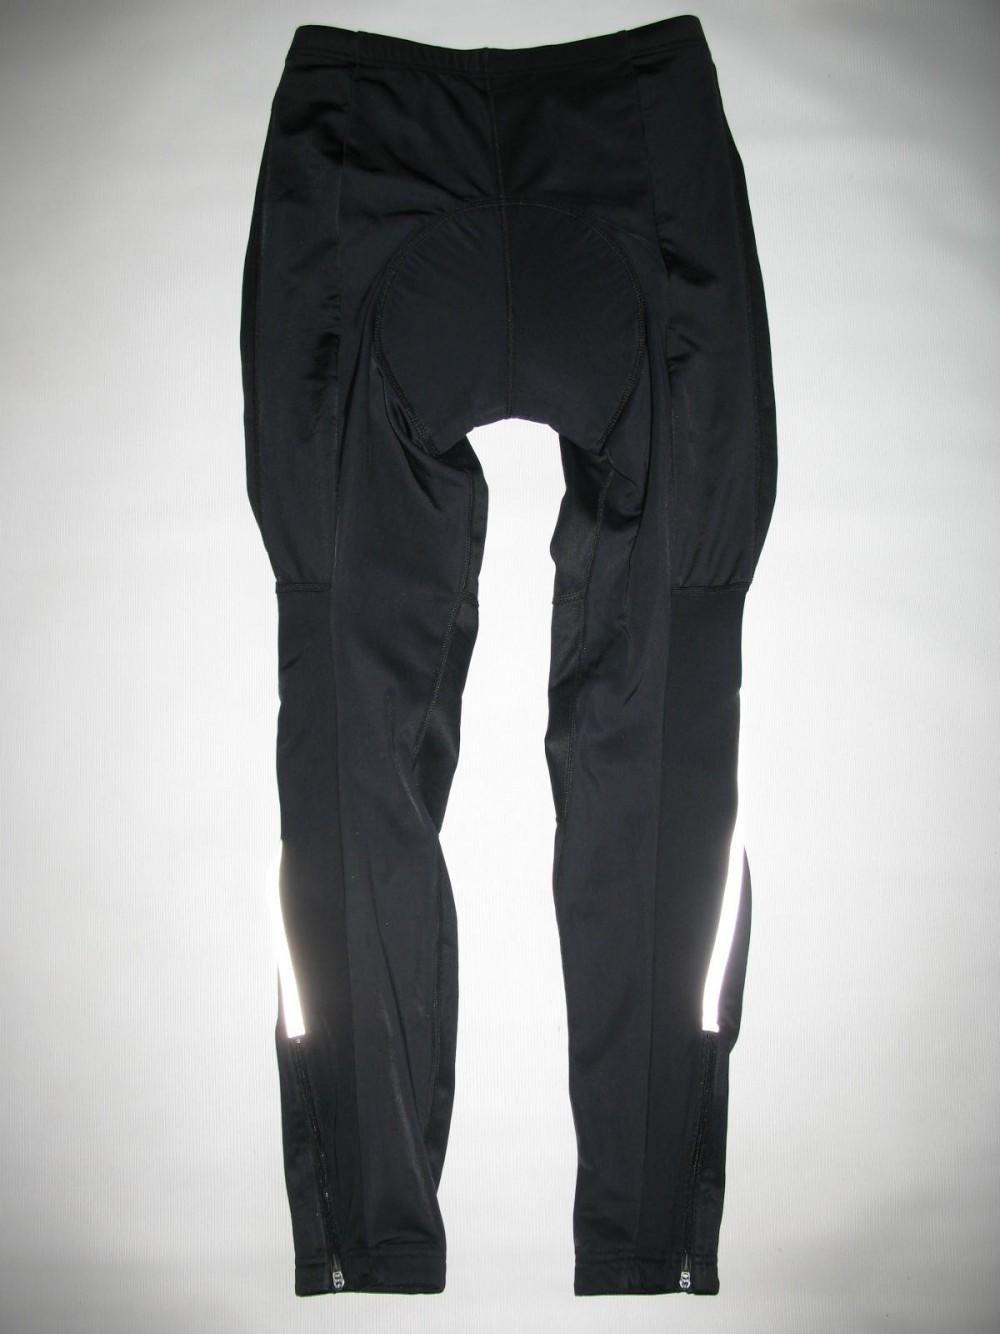 Велобрюки CRANE windstopper cycling pants lady (размер 38-М) - 2